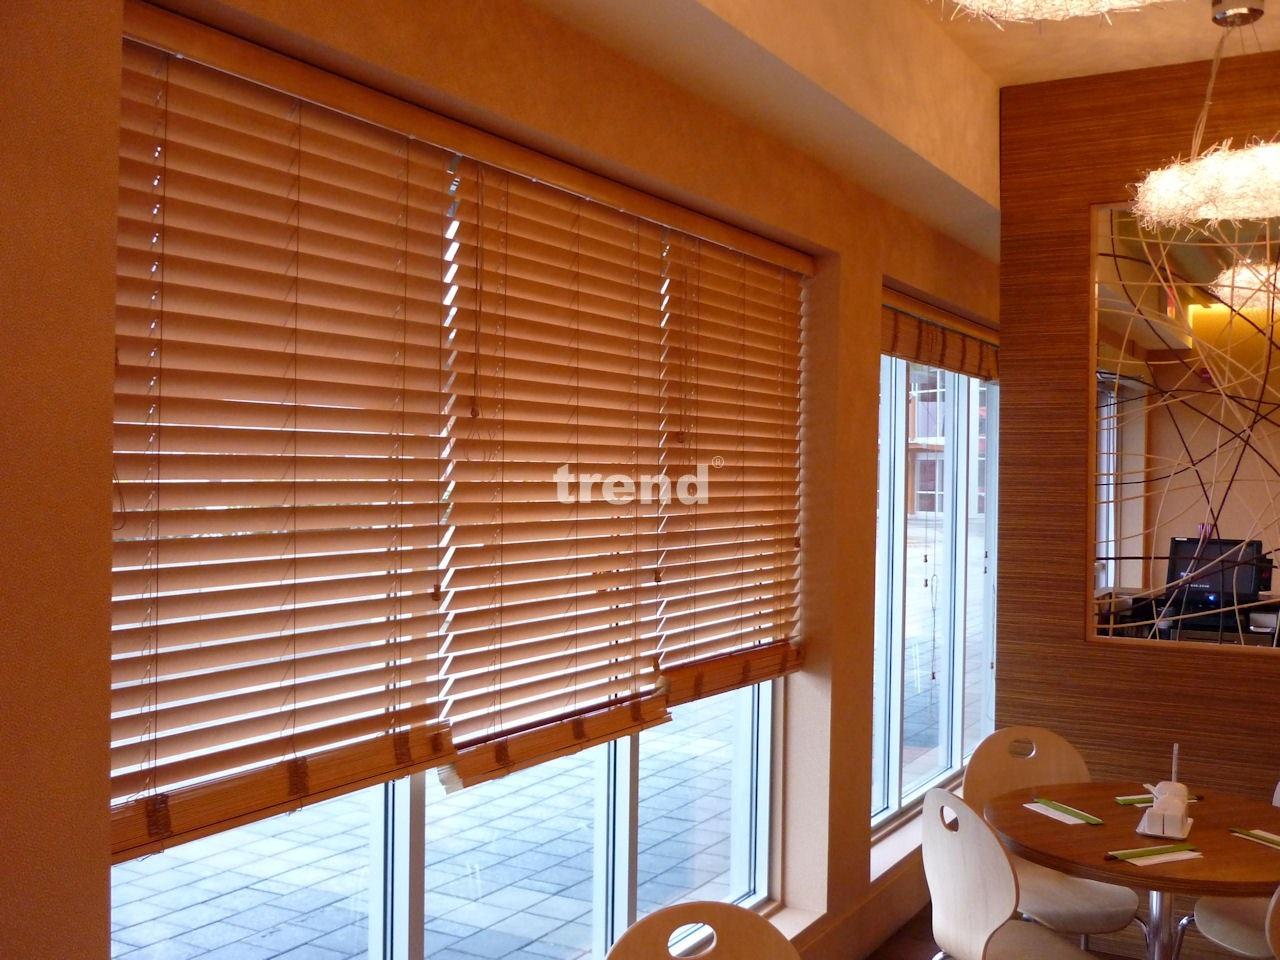 Trend perde sistemleri ah ap jaluzi for Interior blinds and designs